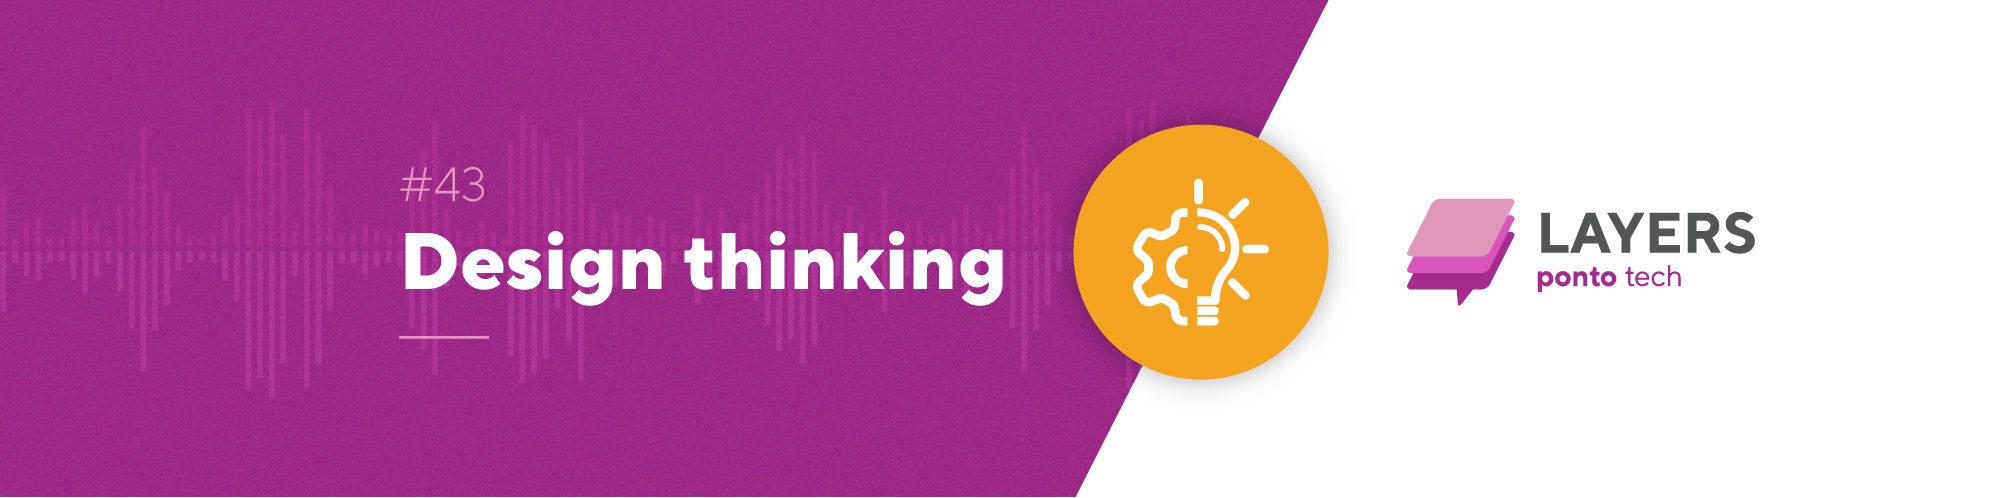 layerpontotech_43_Design_Thinking_banner